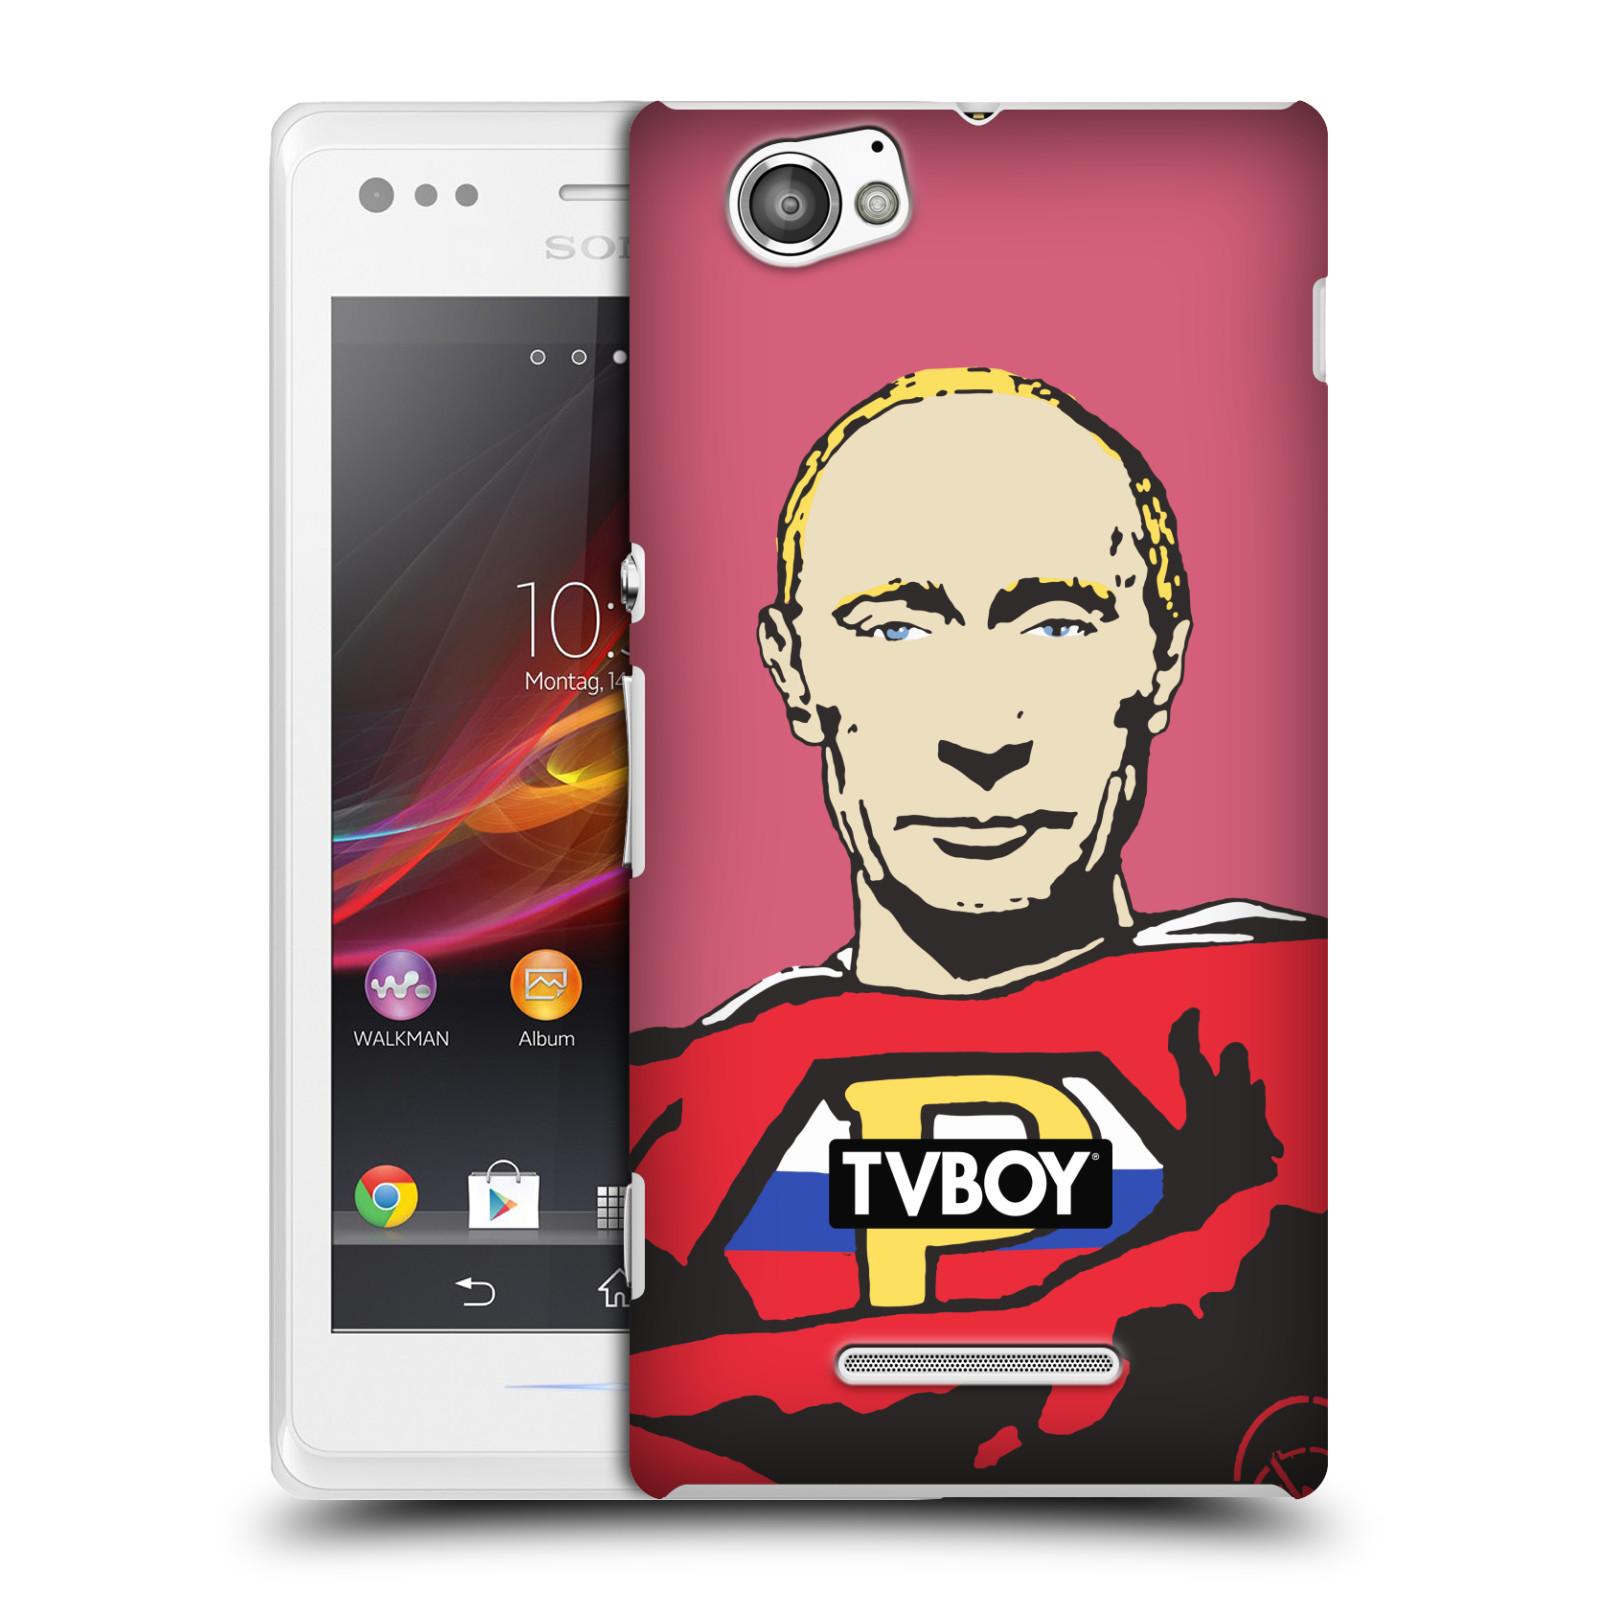 Plastové pouzdro na mobil Sony Xperia M C1905 HEAD CASE - TVBOY - Super Putin (Kryt či obal na mobilní telefon s licencovaným motivem TVBOY pro Sony Xperia M )